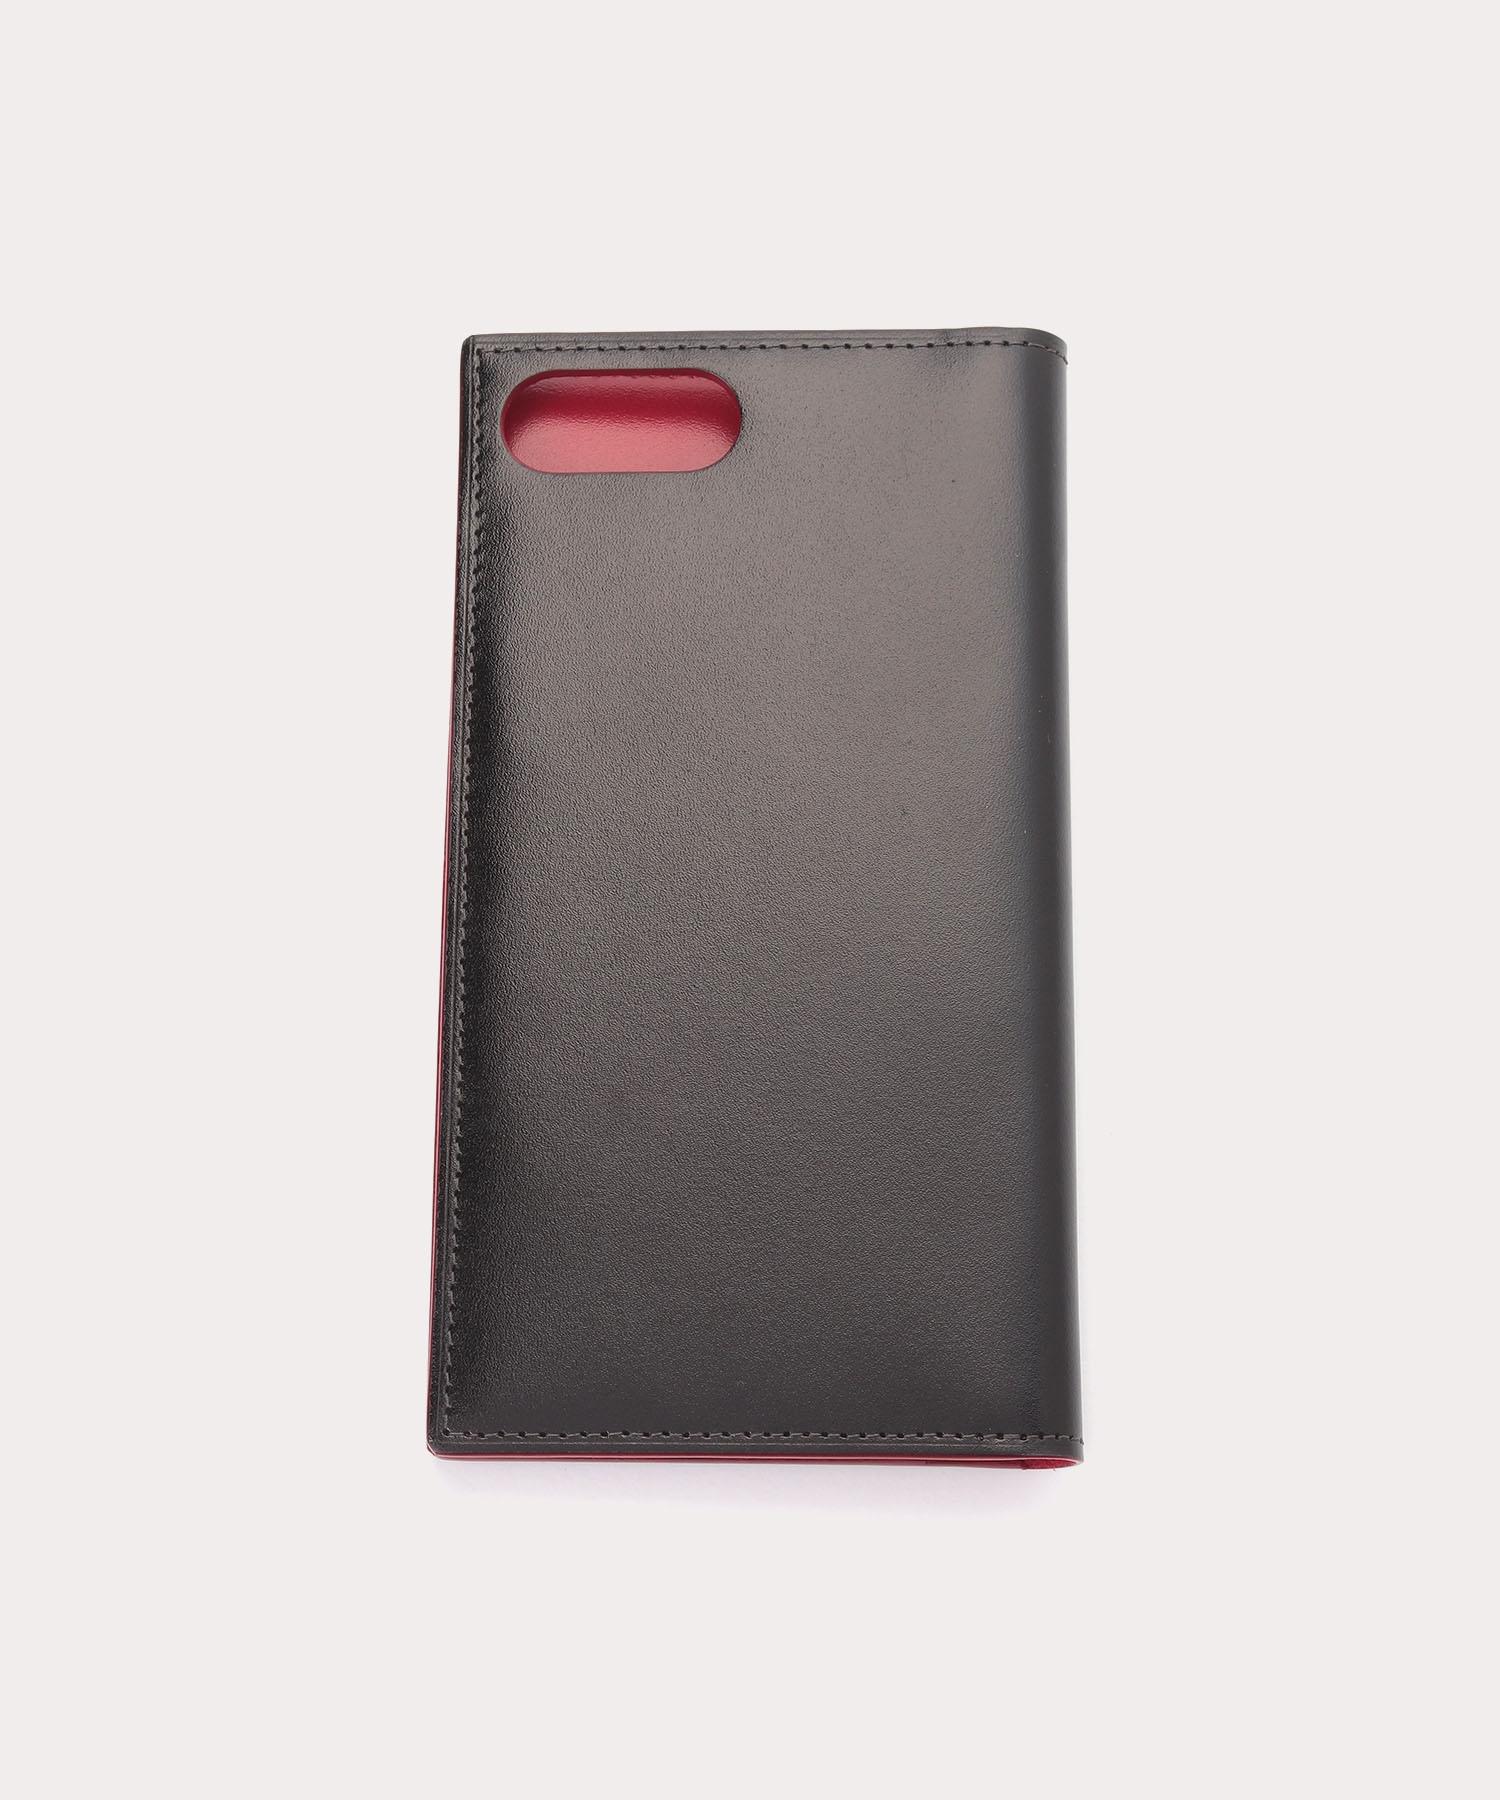 【iPhone 7/8 Plus用】SIMPLE TINY ORB スマホケース